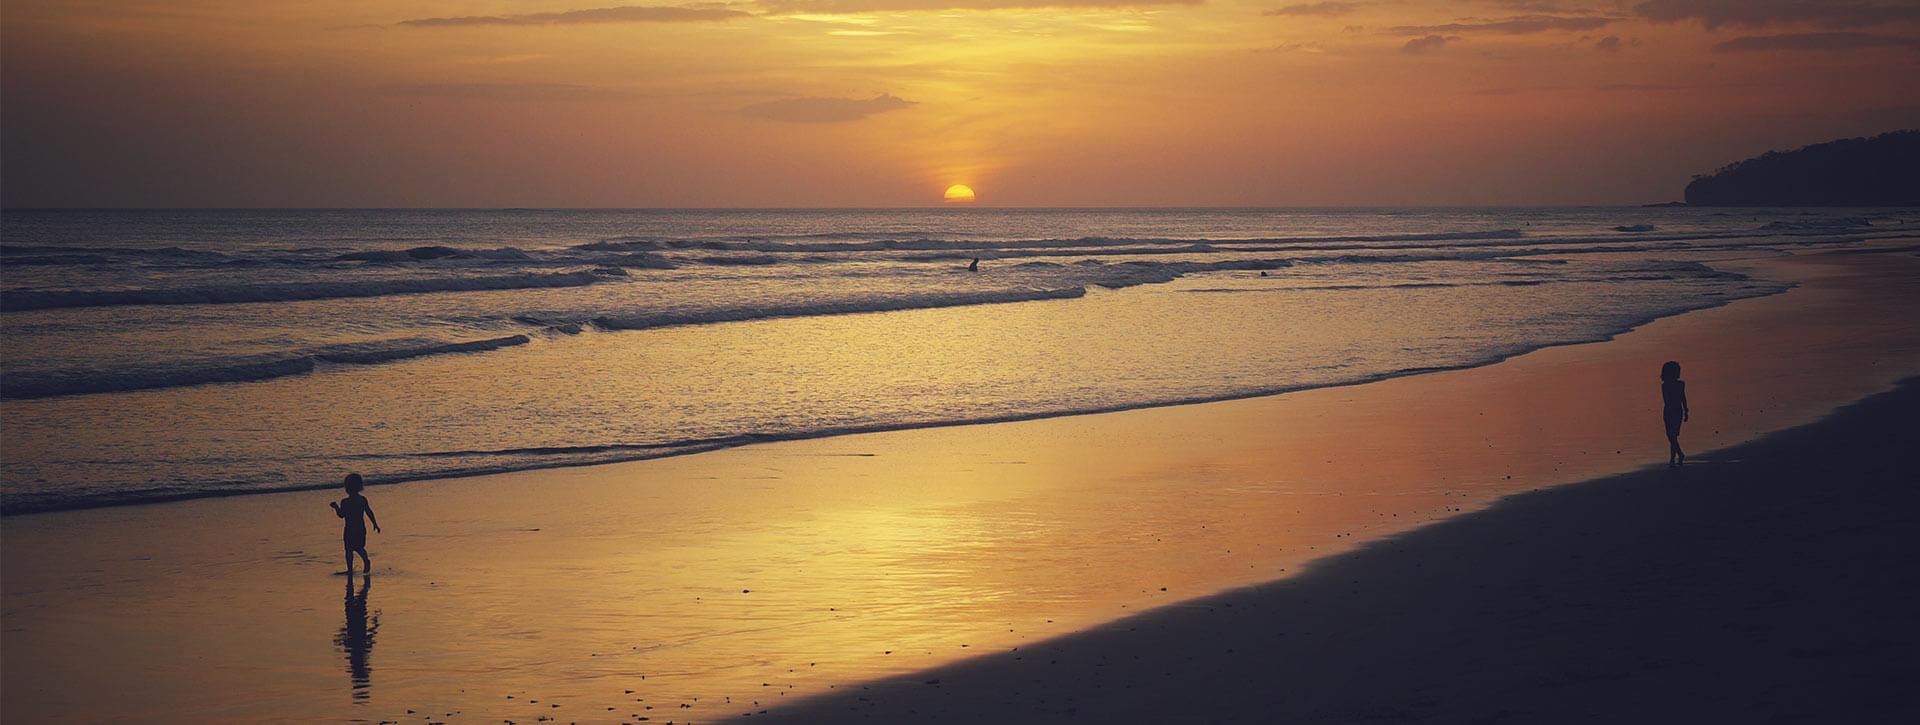 The Land of Beautiful Beaches